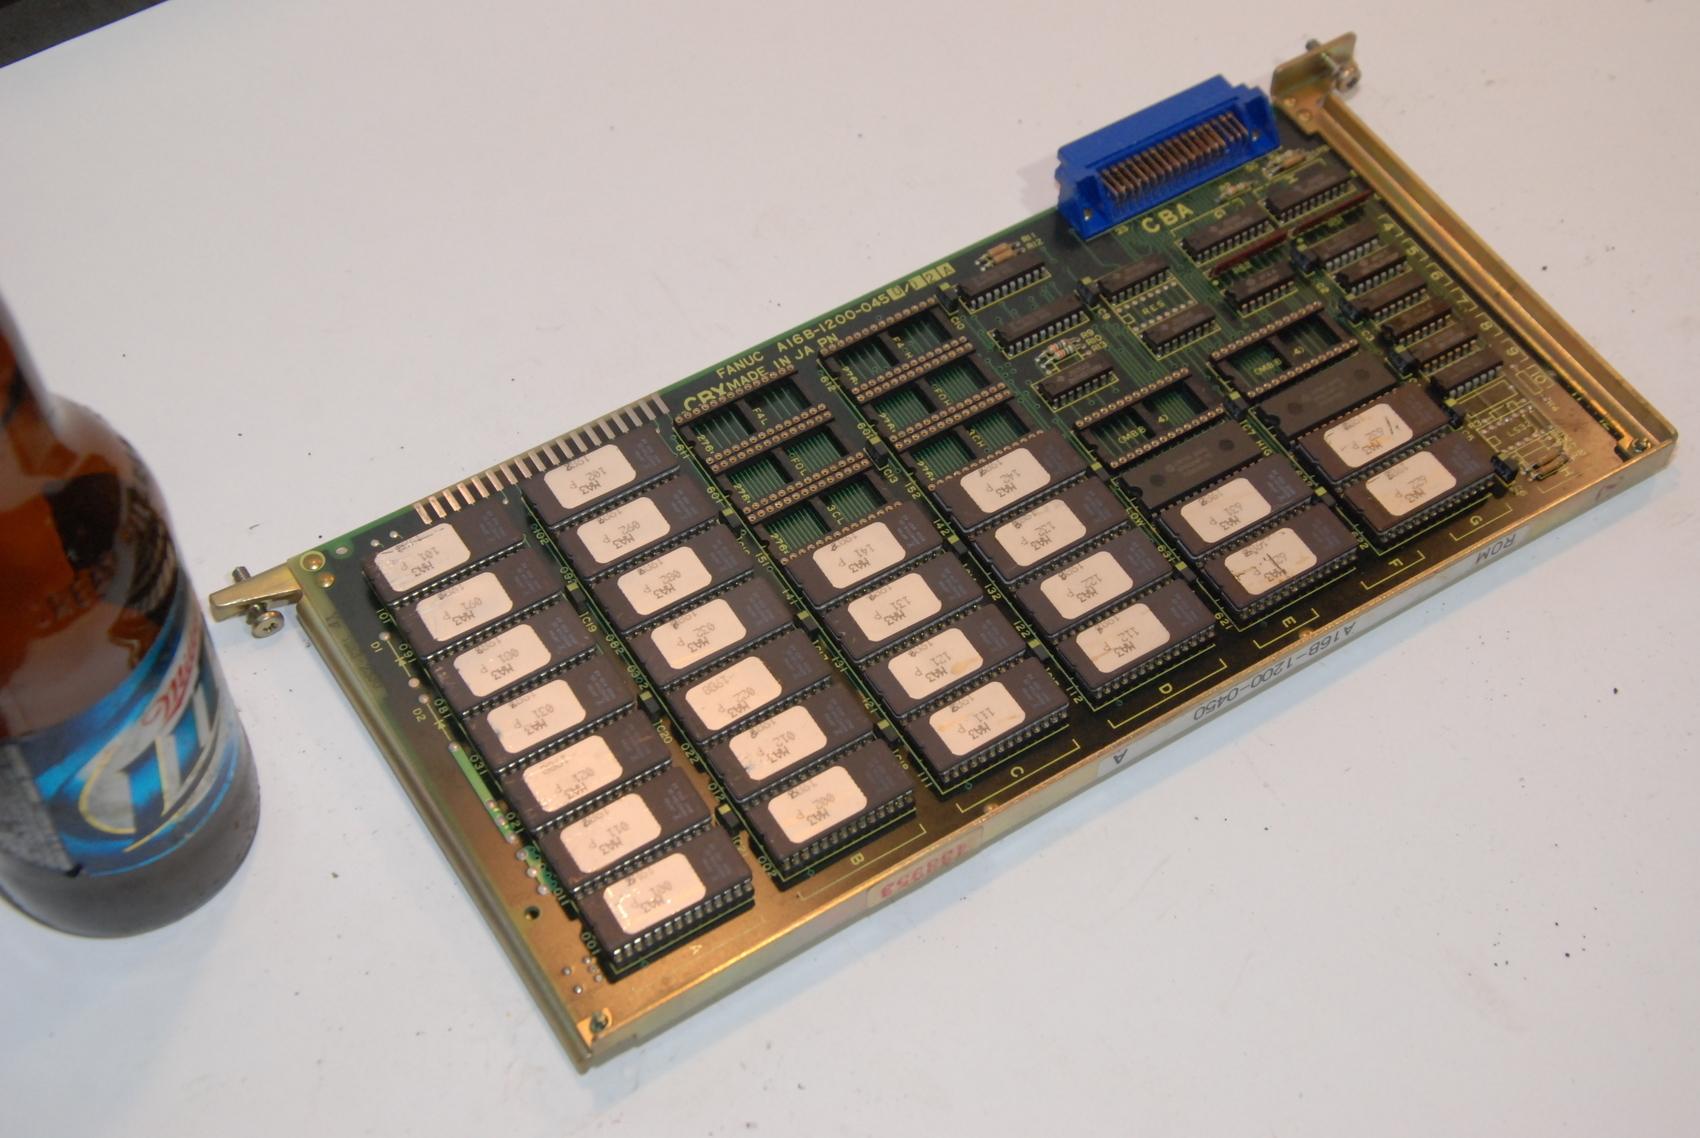 Fanuc A16B-1200-0450/02A board